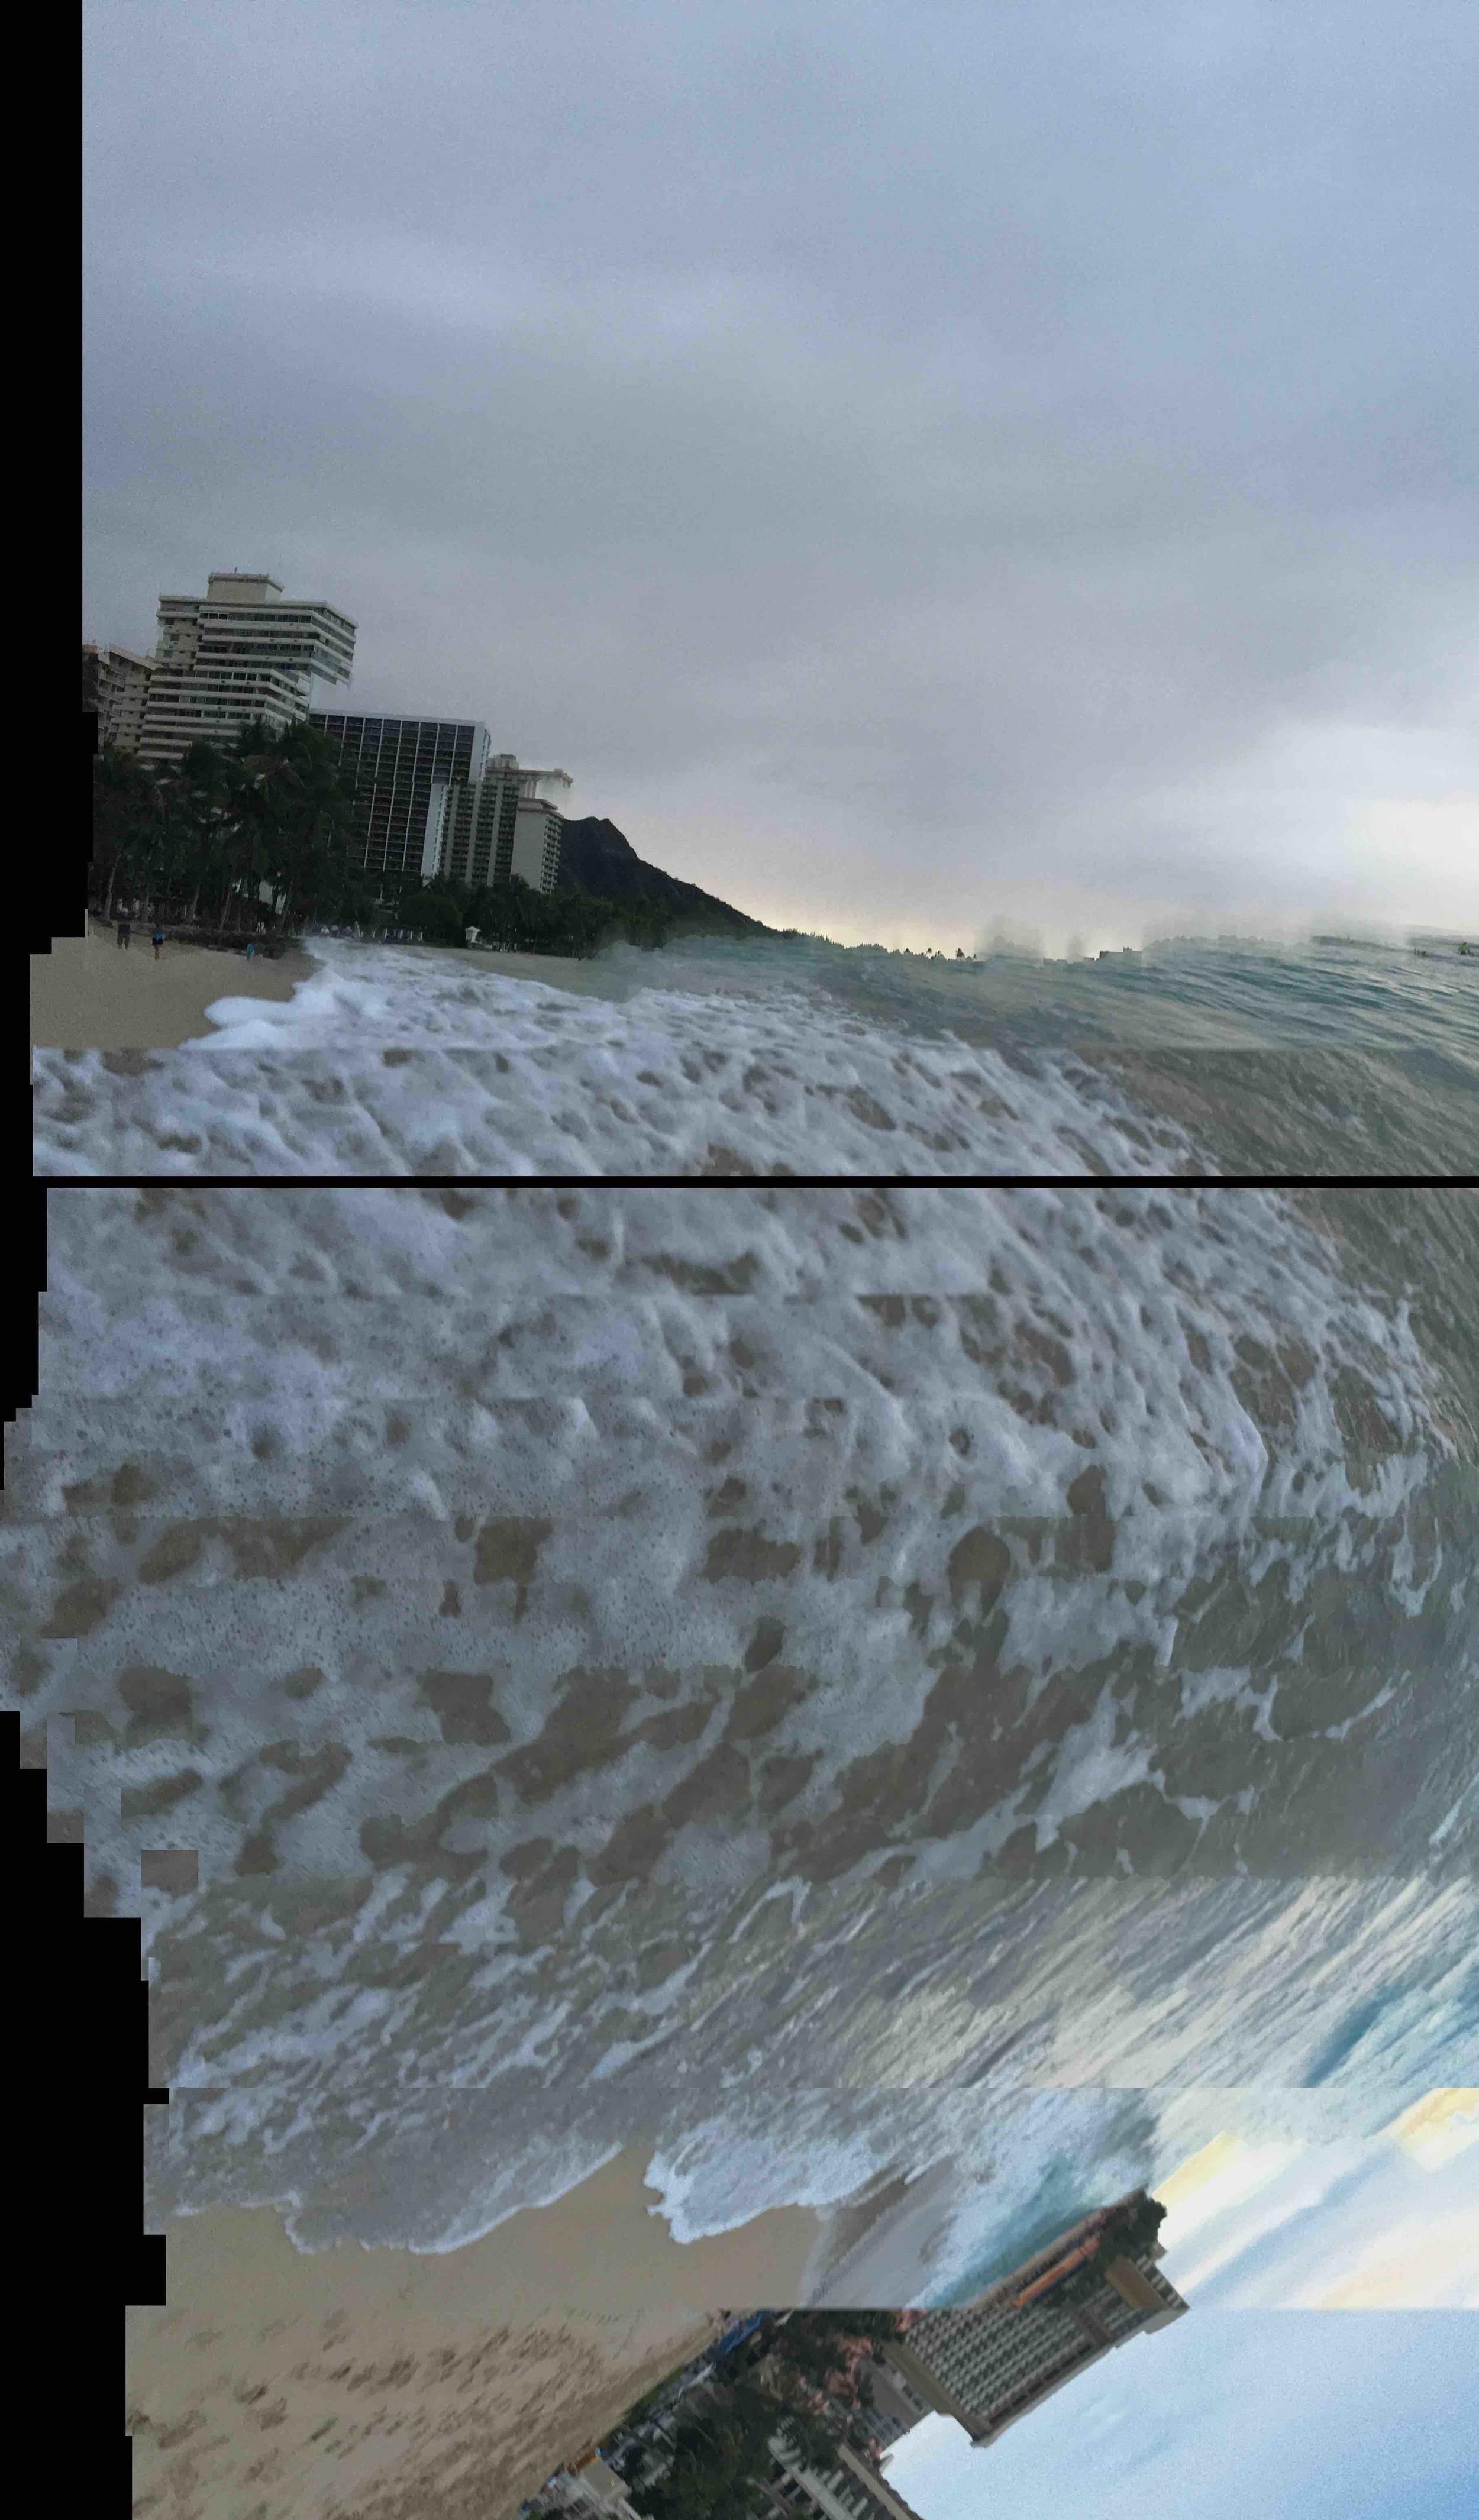 Waikiki Beach,20 January 2016_6  Photograph c  opyright © Tennyson Woodbridge, 1963 to present